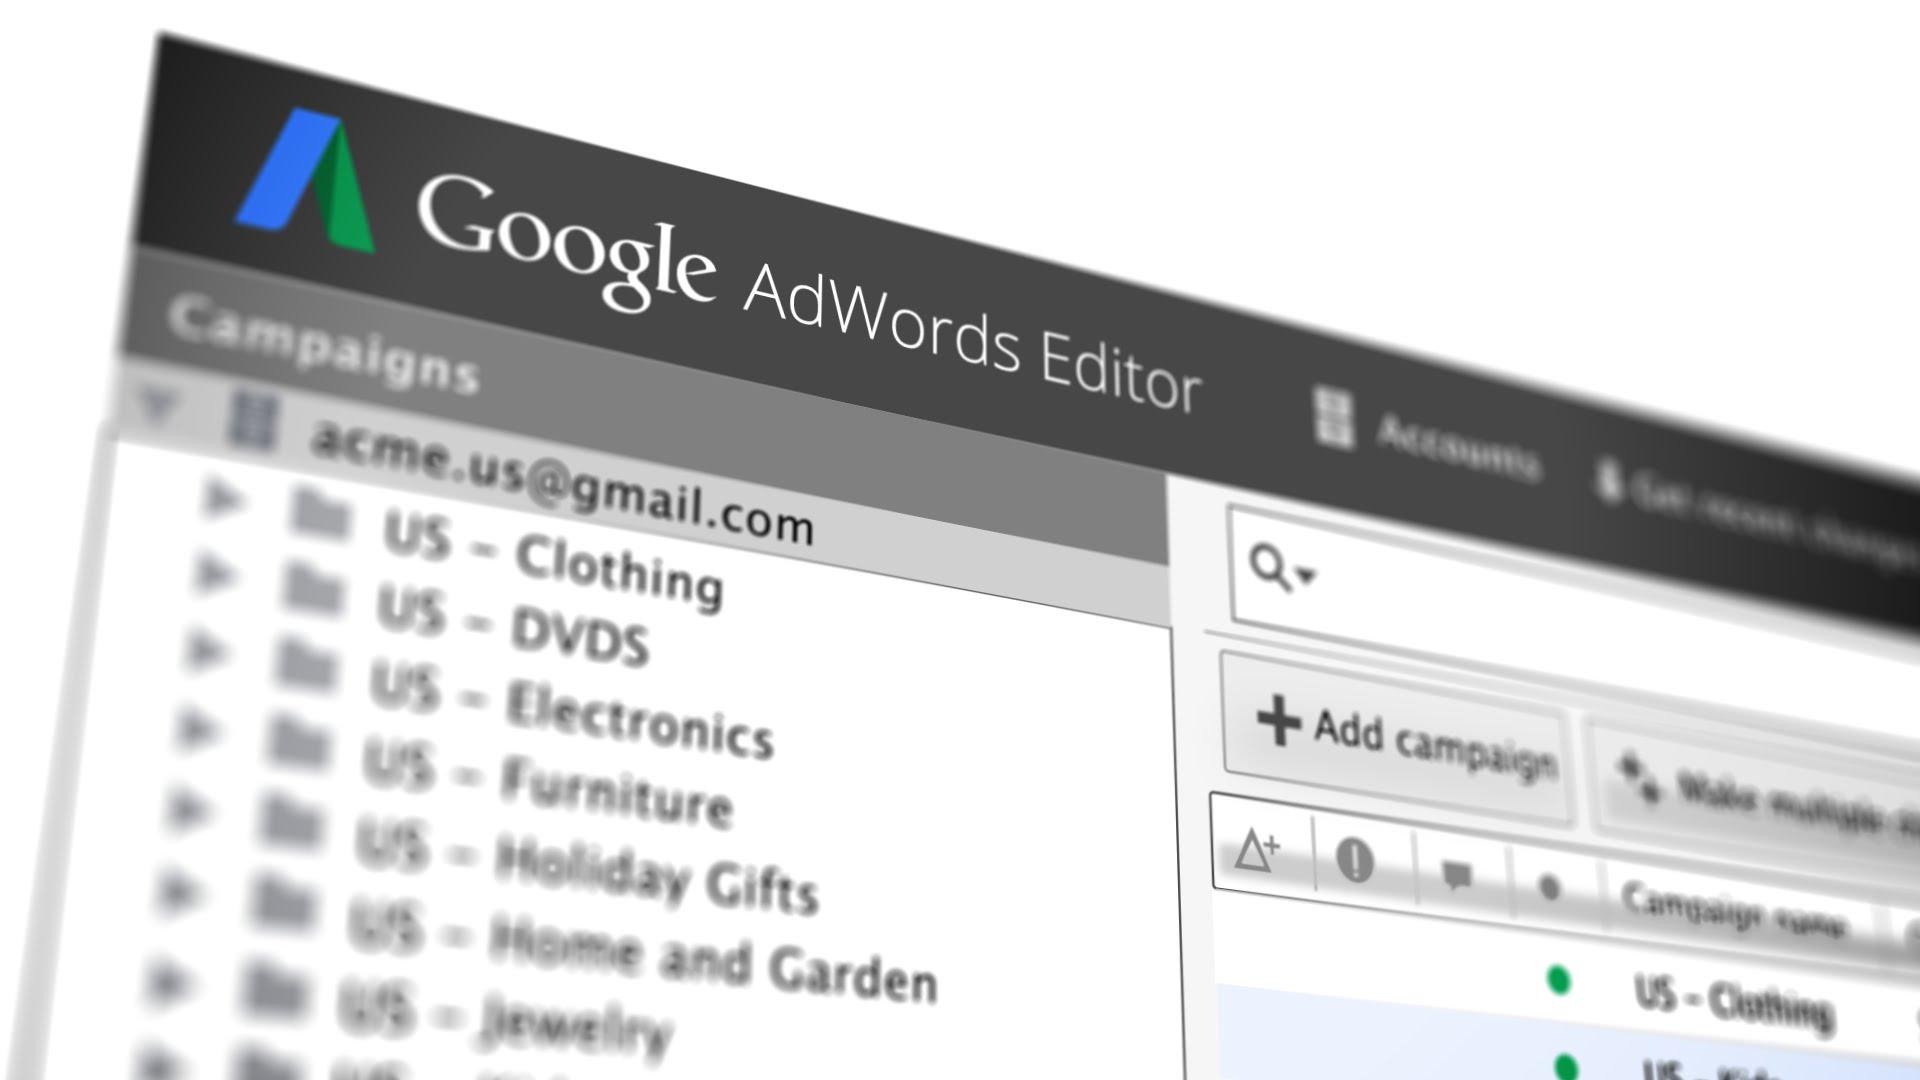 AdWords Editor 10